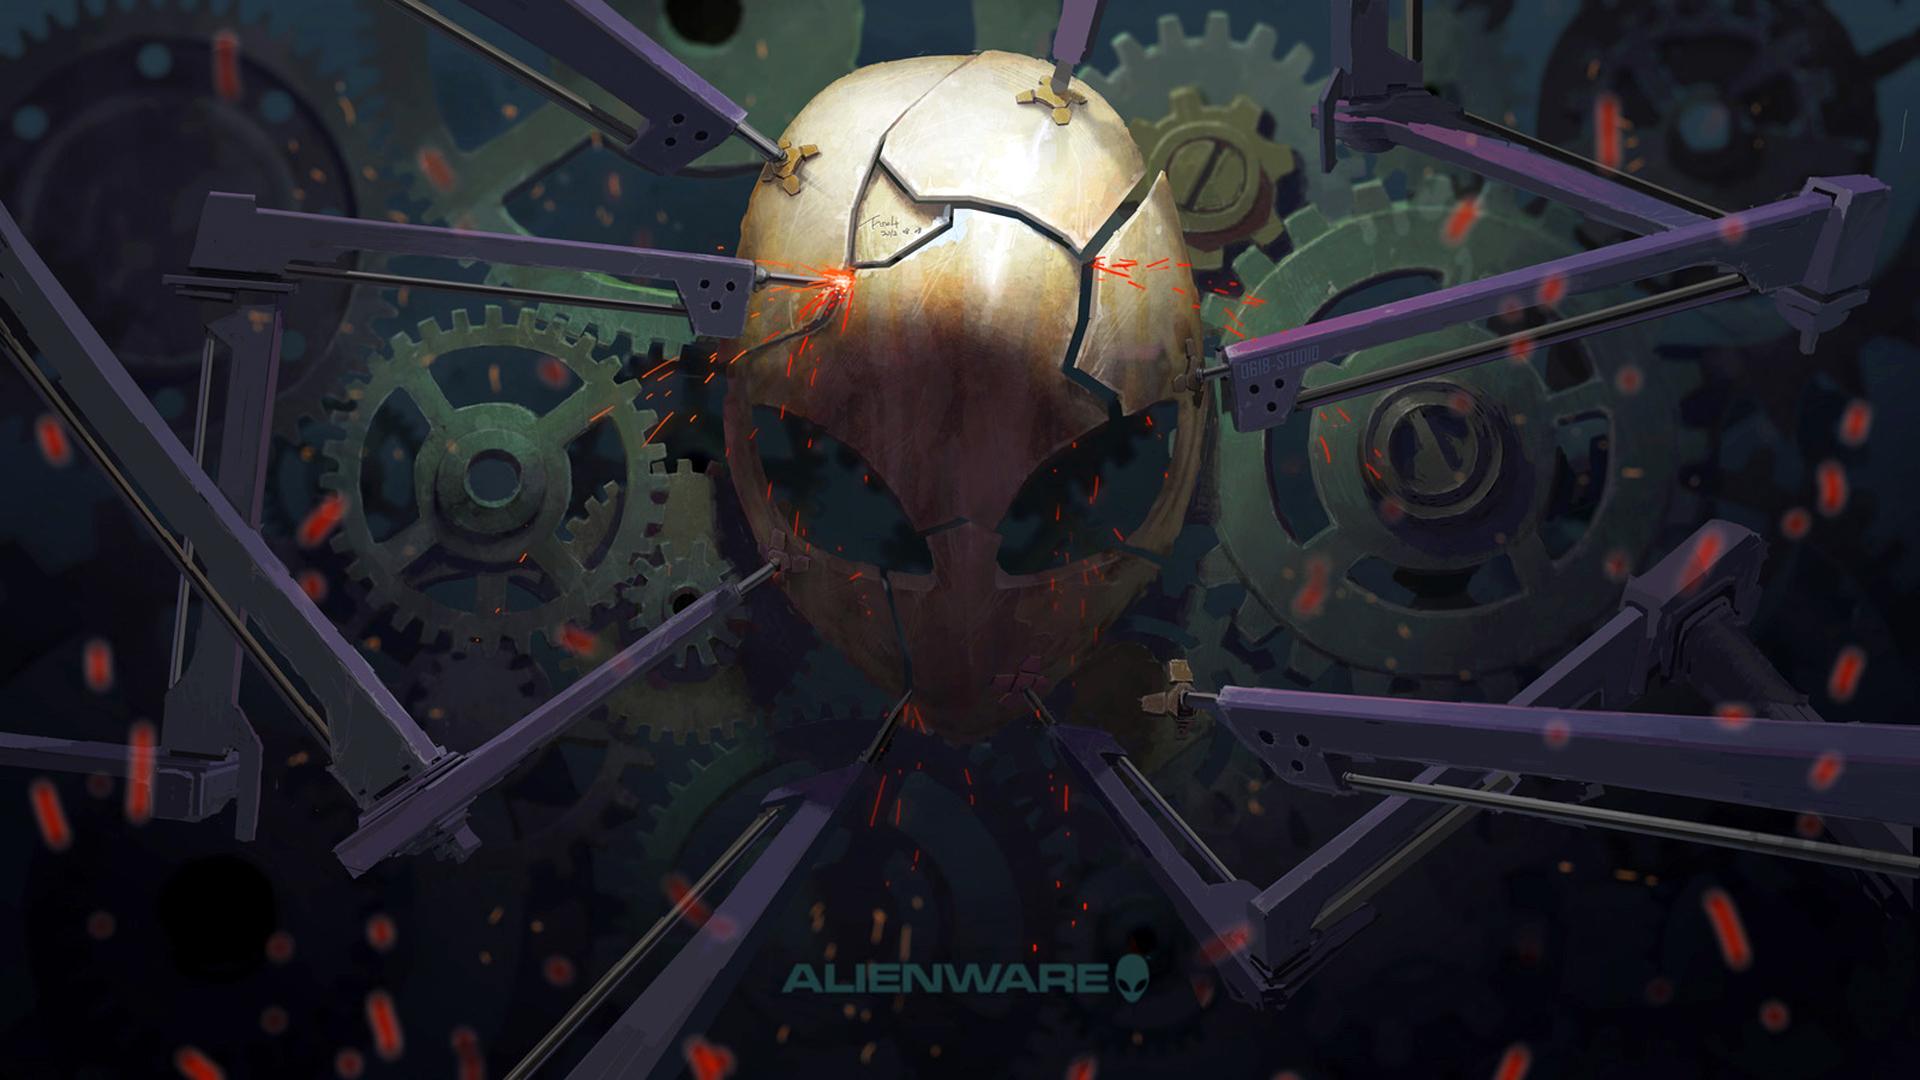 alienware broken mask cool logo 1920x1080 1080p wallpaper compatible 1920x1080